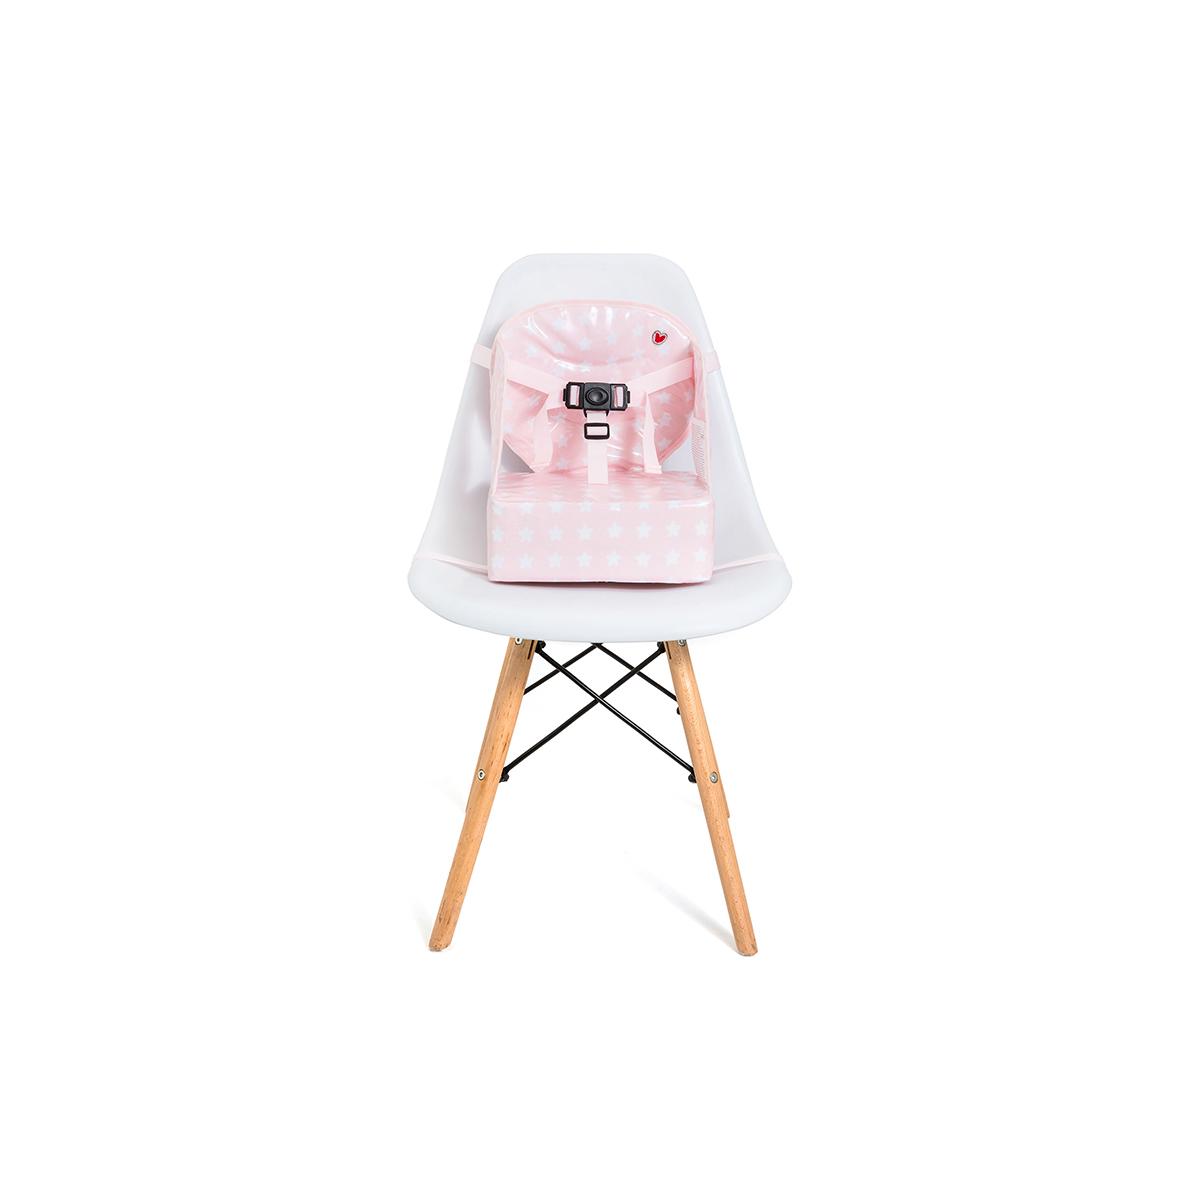 Rehausseur de chaise Easy Up ROSE BabyToLove